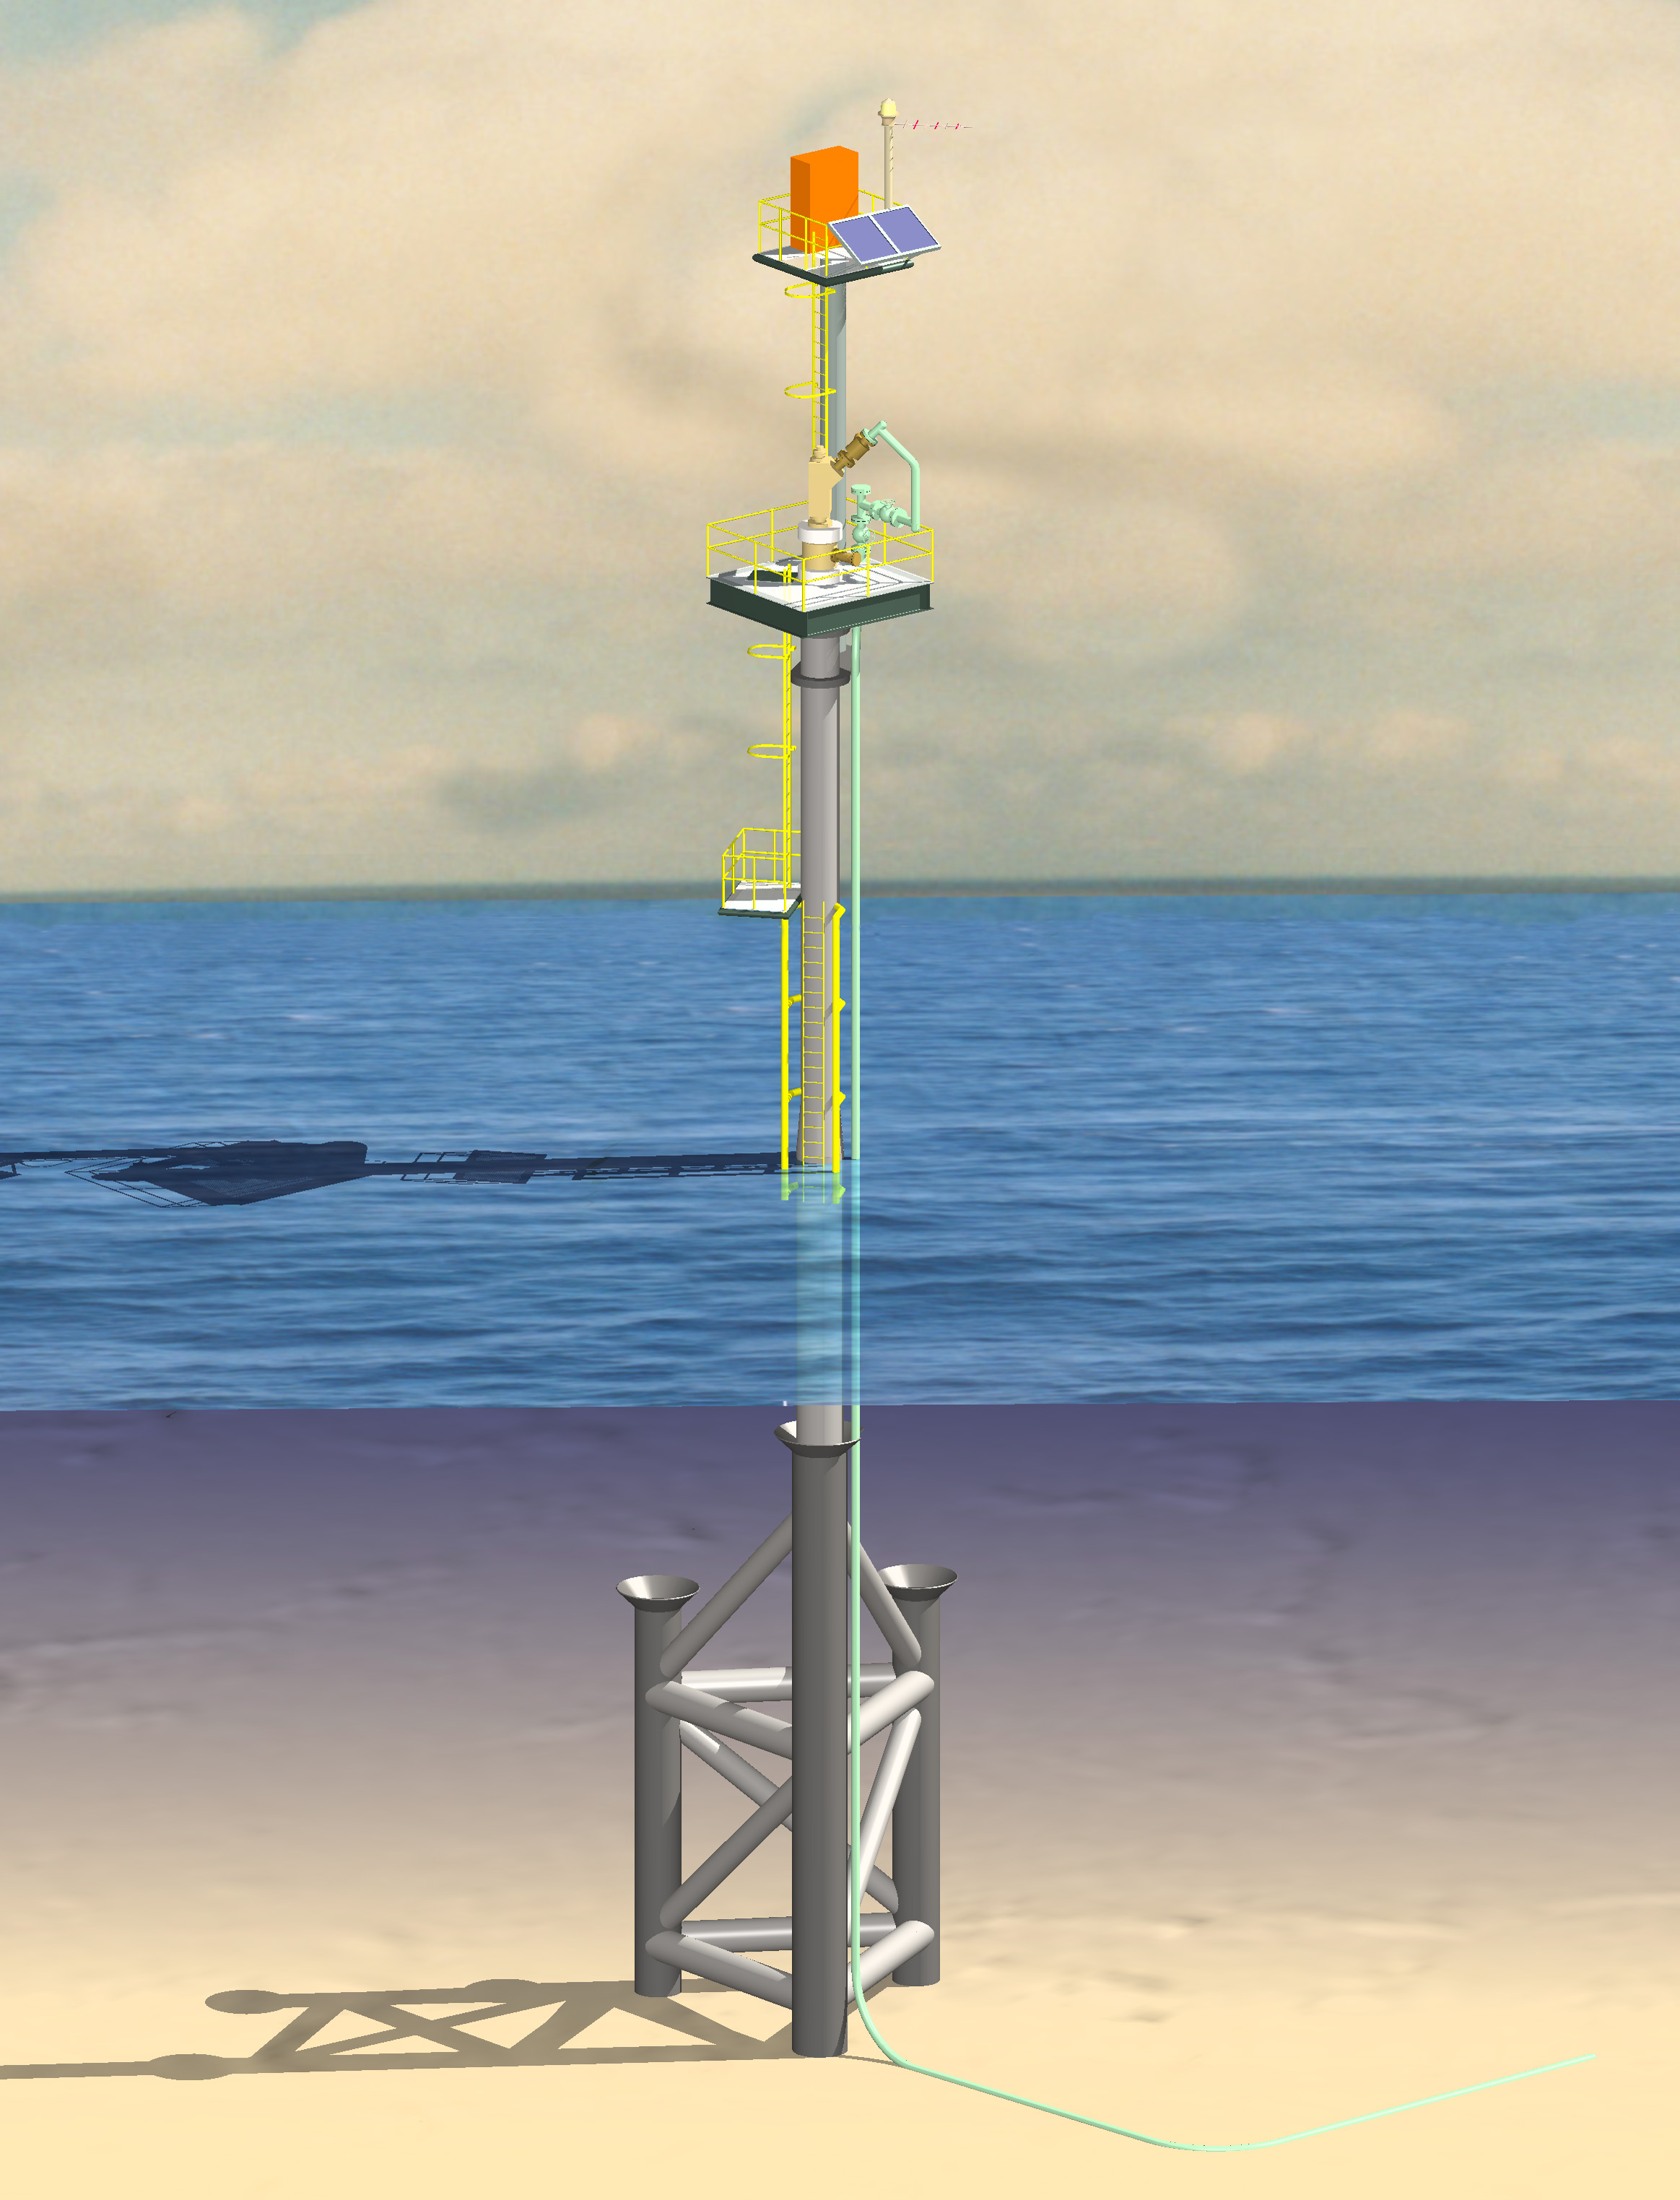 ICON Engineering - For minimal wellhead platforms where wave